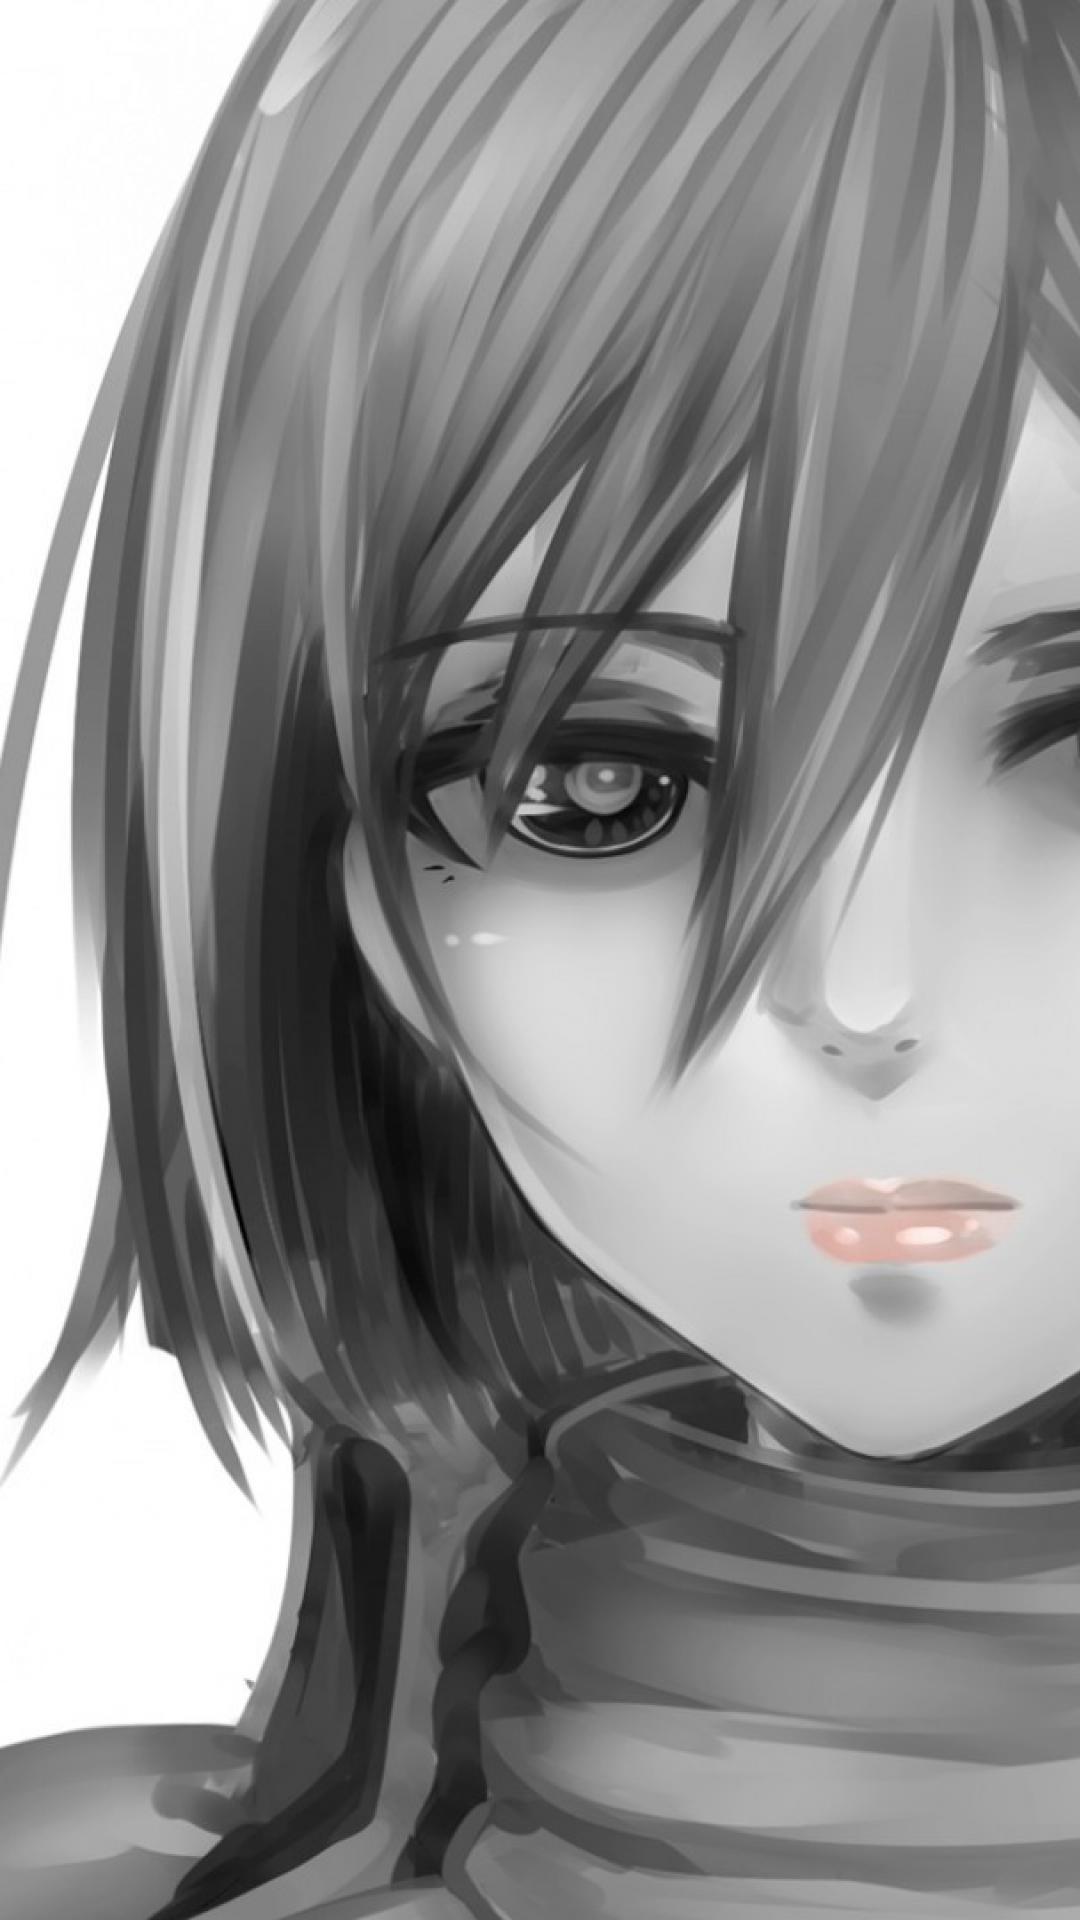 Mikasa Wallpaper Hd Hp 1080x1920 Download Hd Wallpaper Wallpapertip